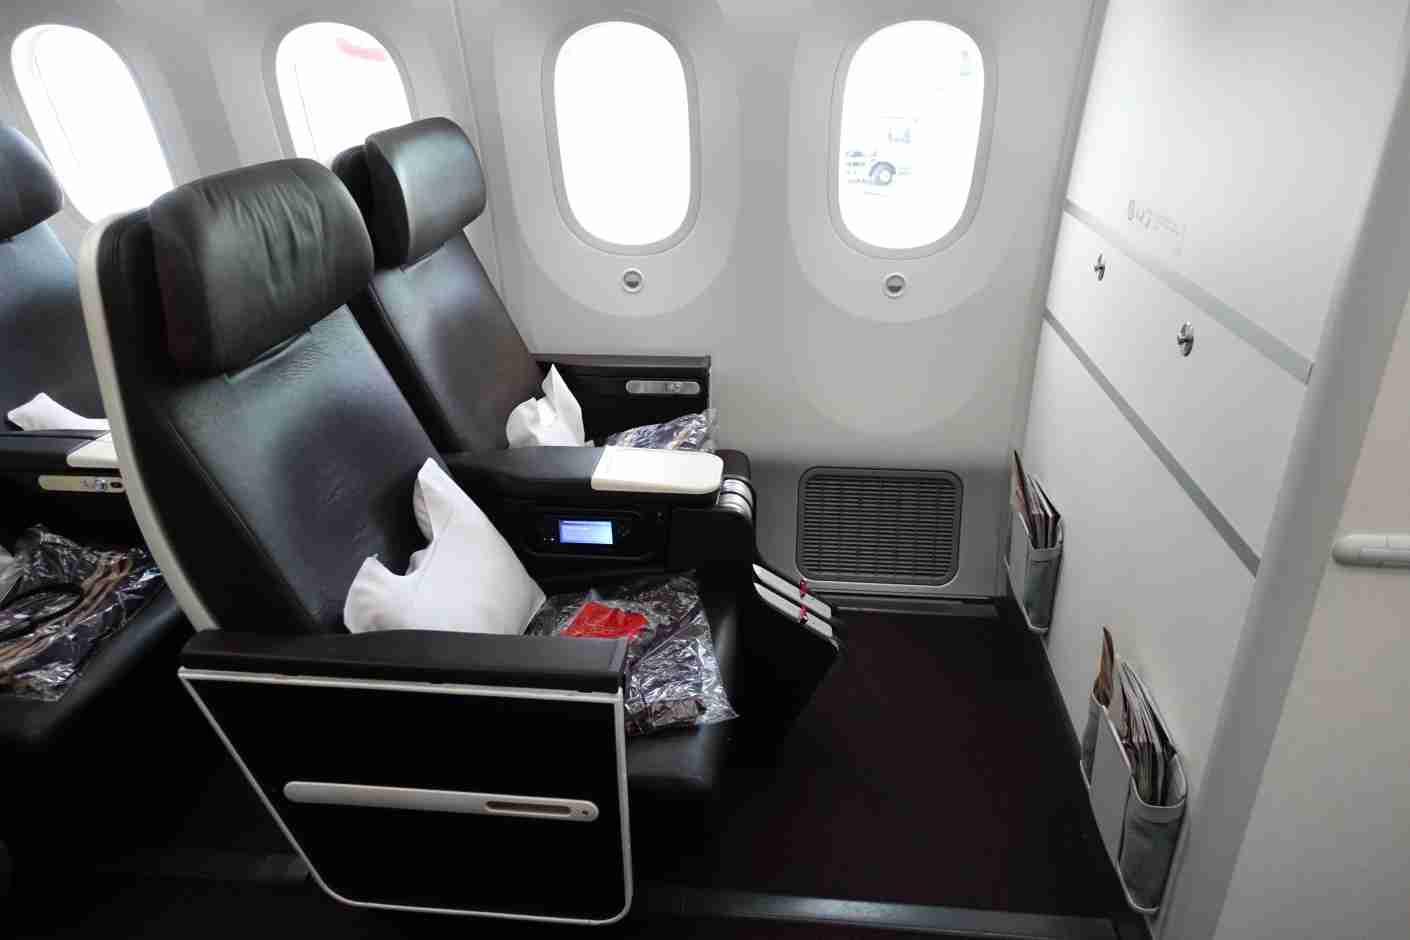 Virgin Atlantic prem econ seat